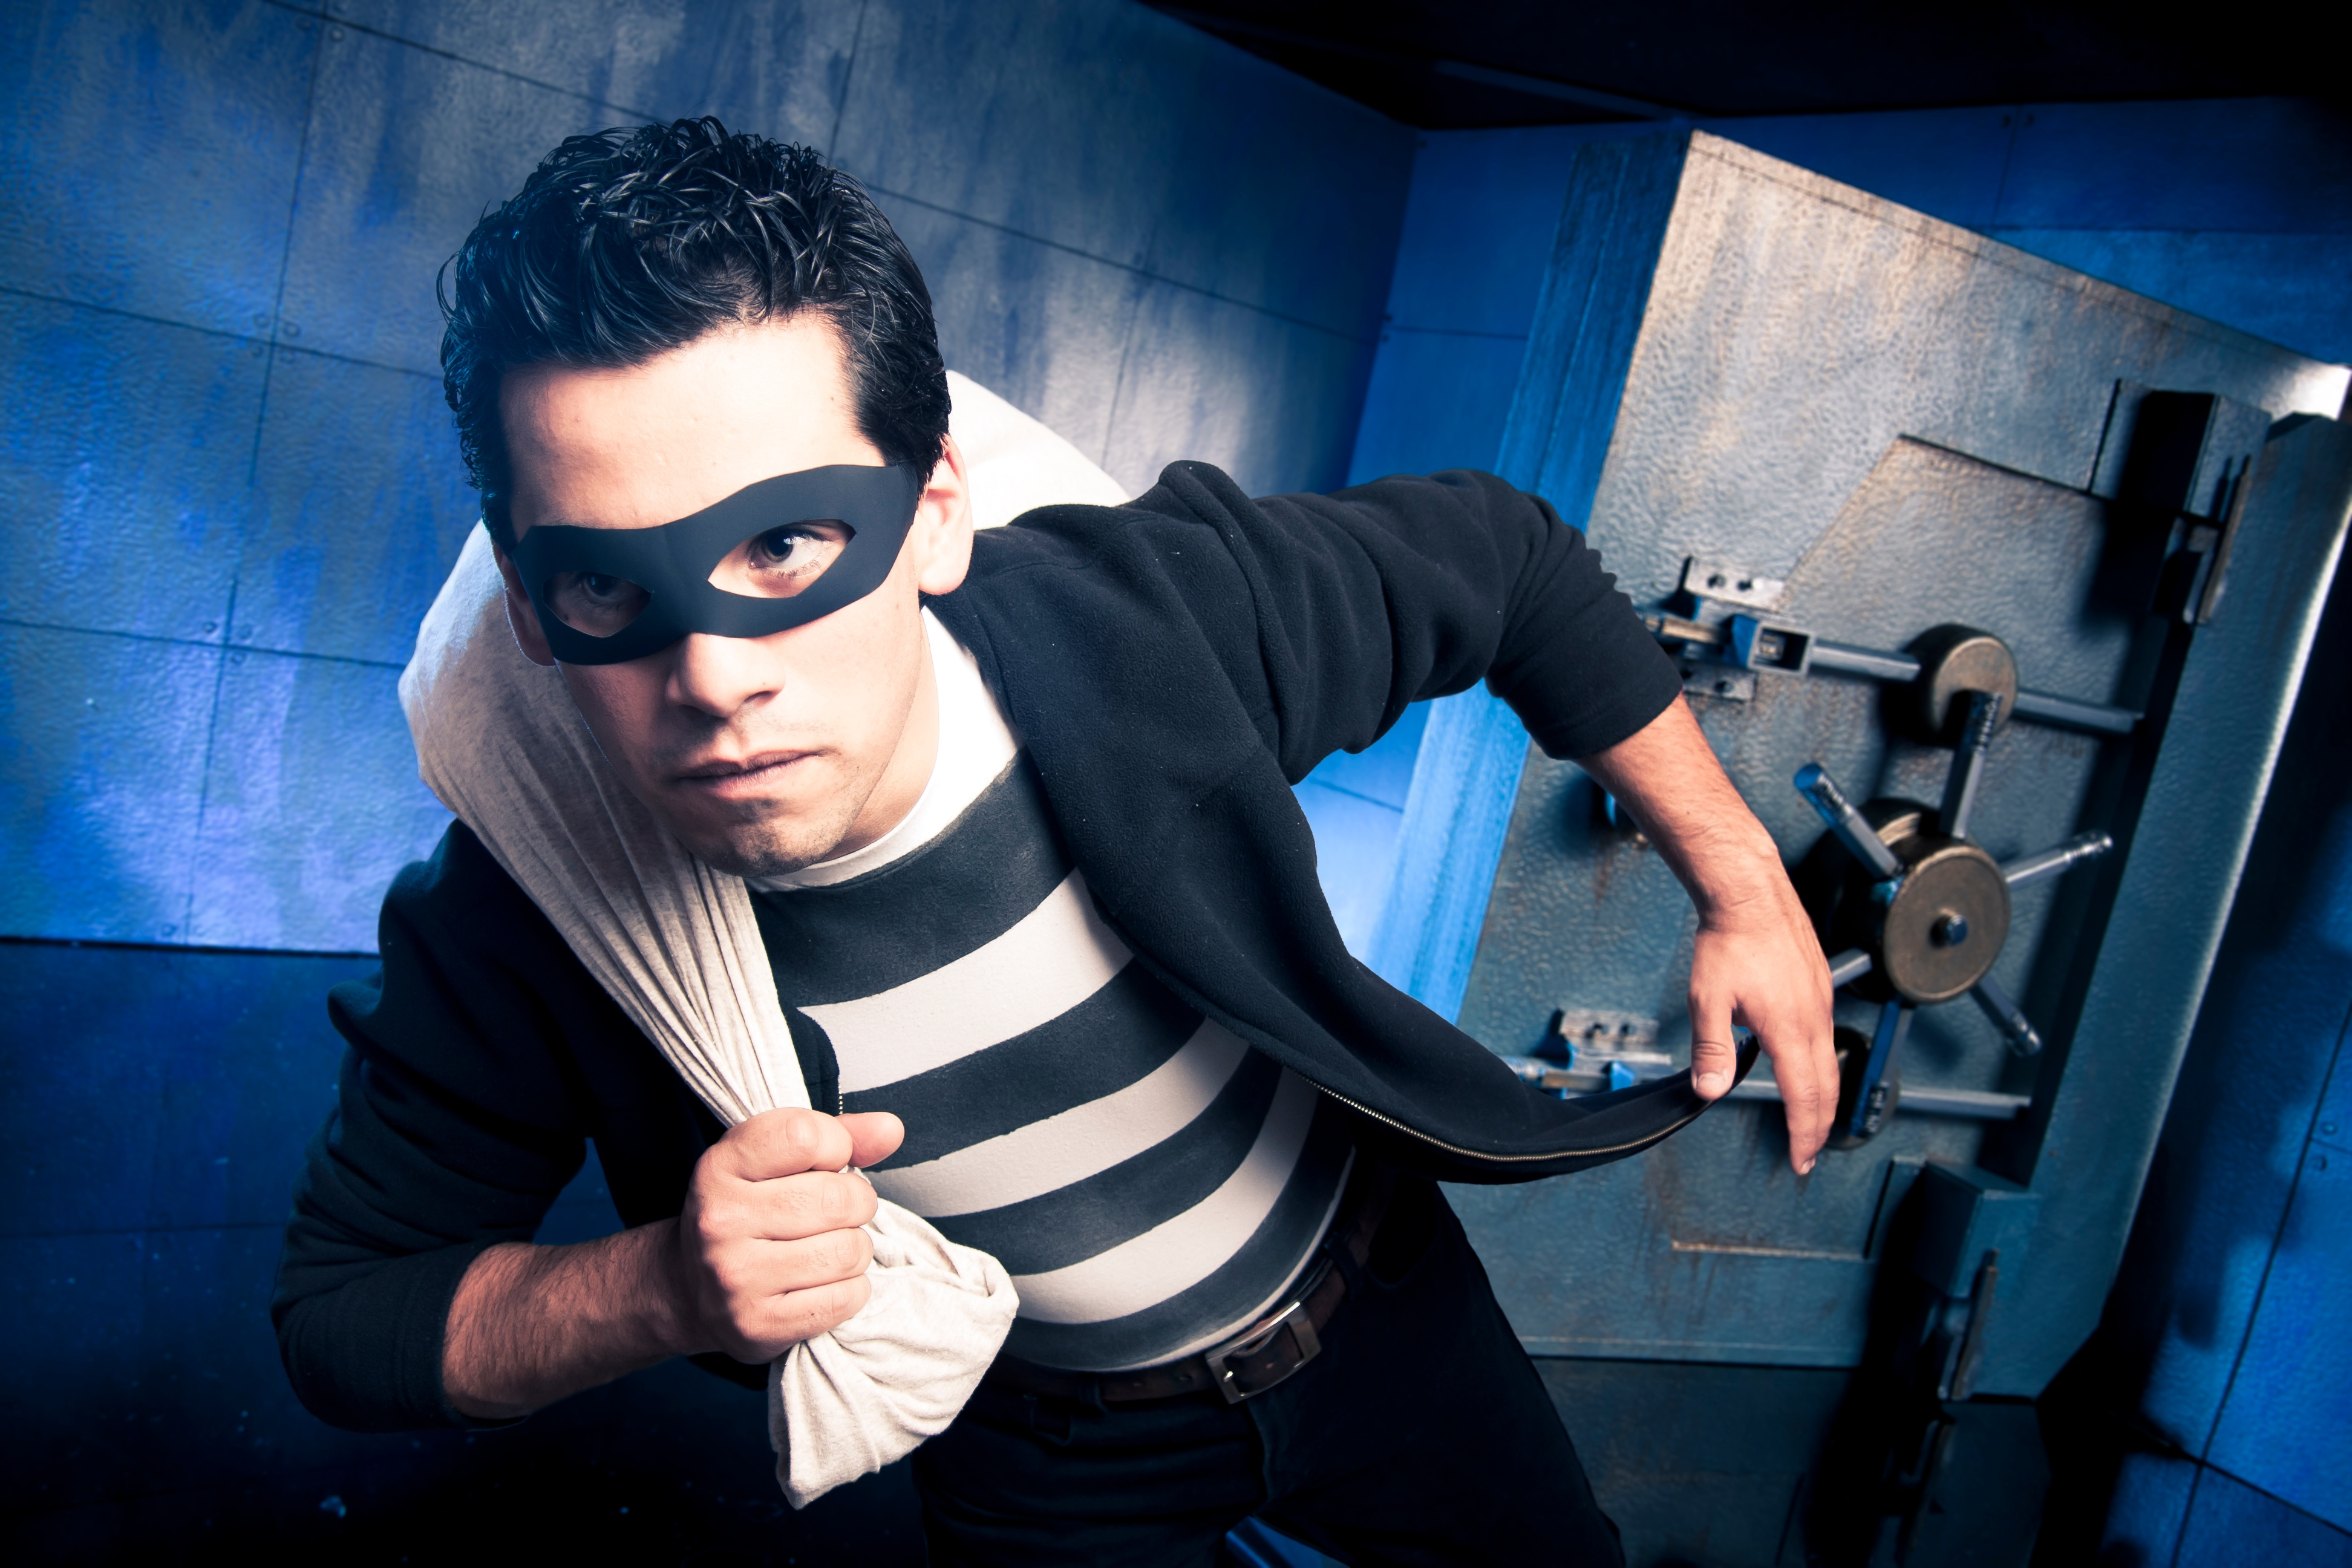 robber leaving bank safe.jpg